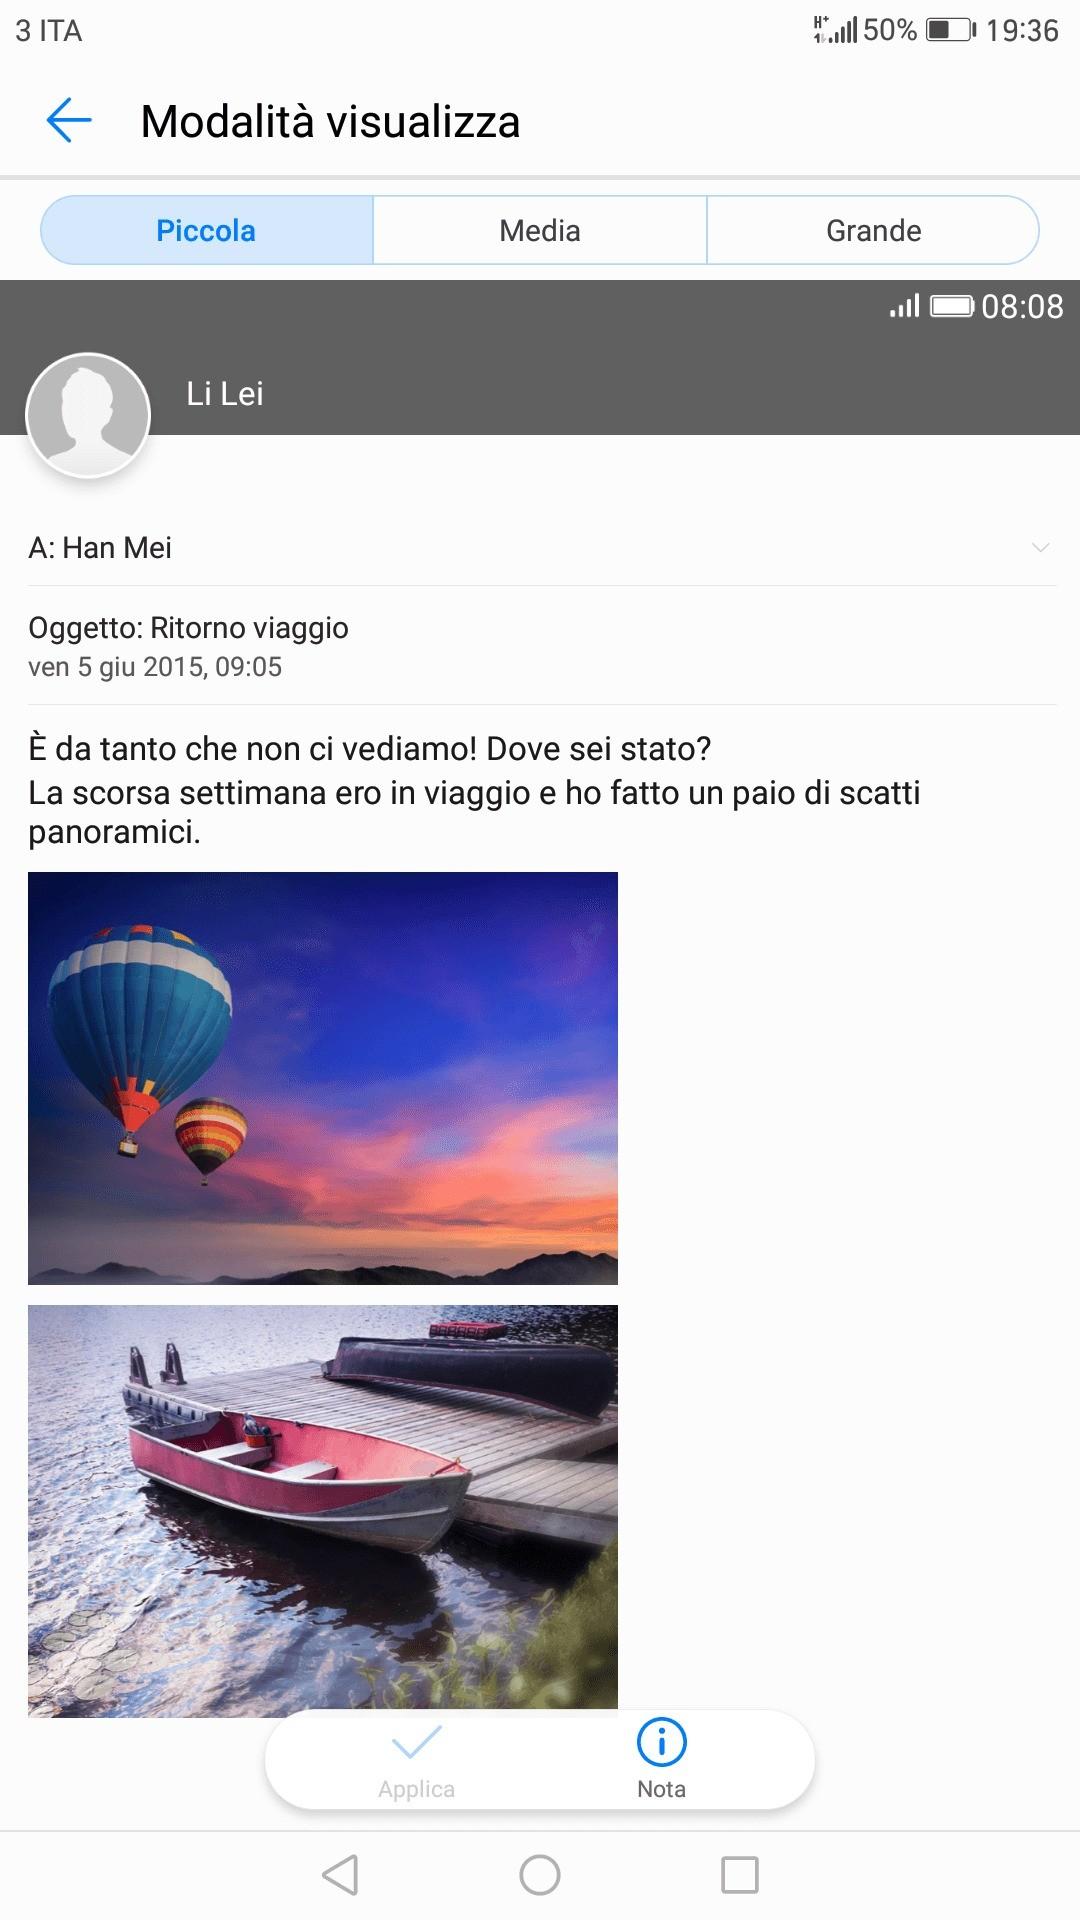 Huawei Mate 9: la nostra recensione completa